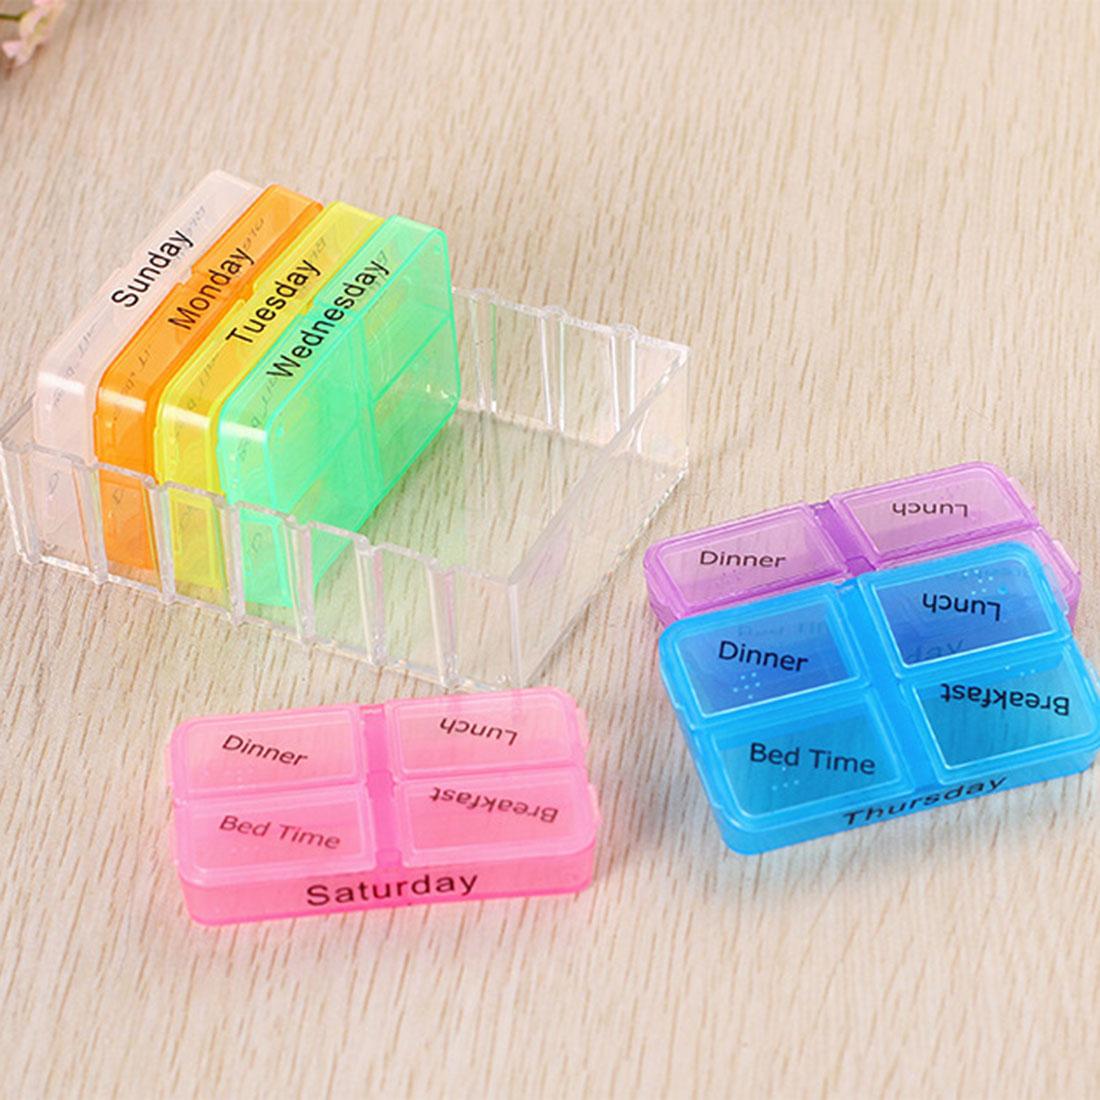 Wholesale Portable Medicine Container Case 7Days Storage Pill Box Health Care Organizer(China (Mainland))